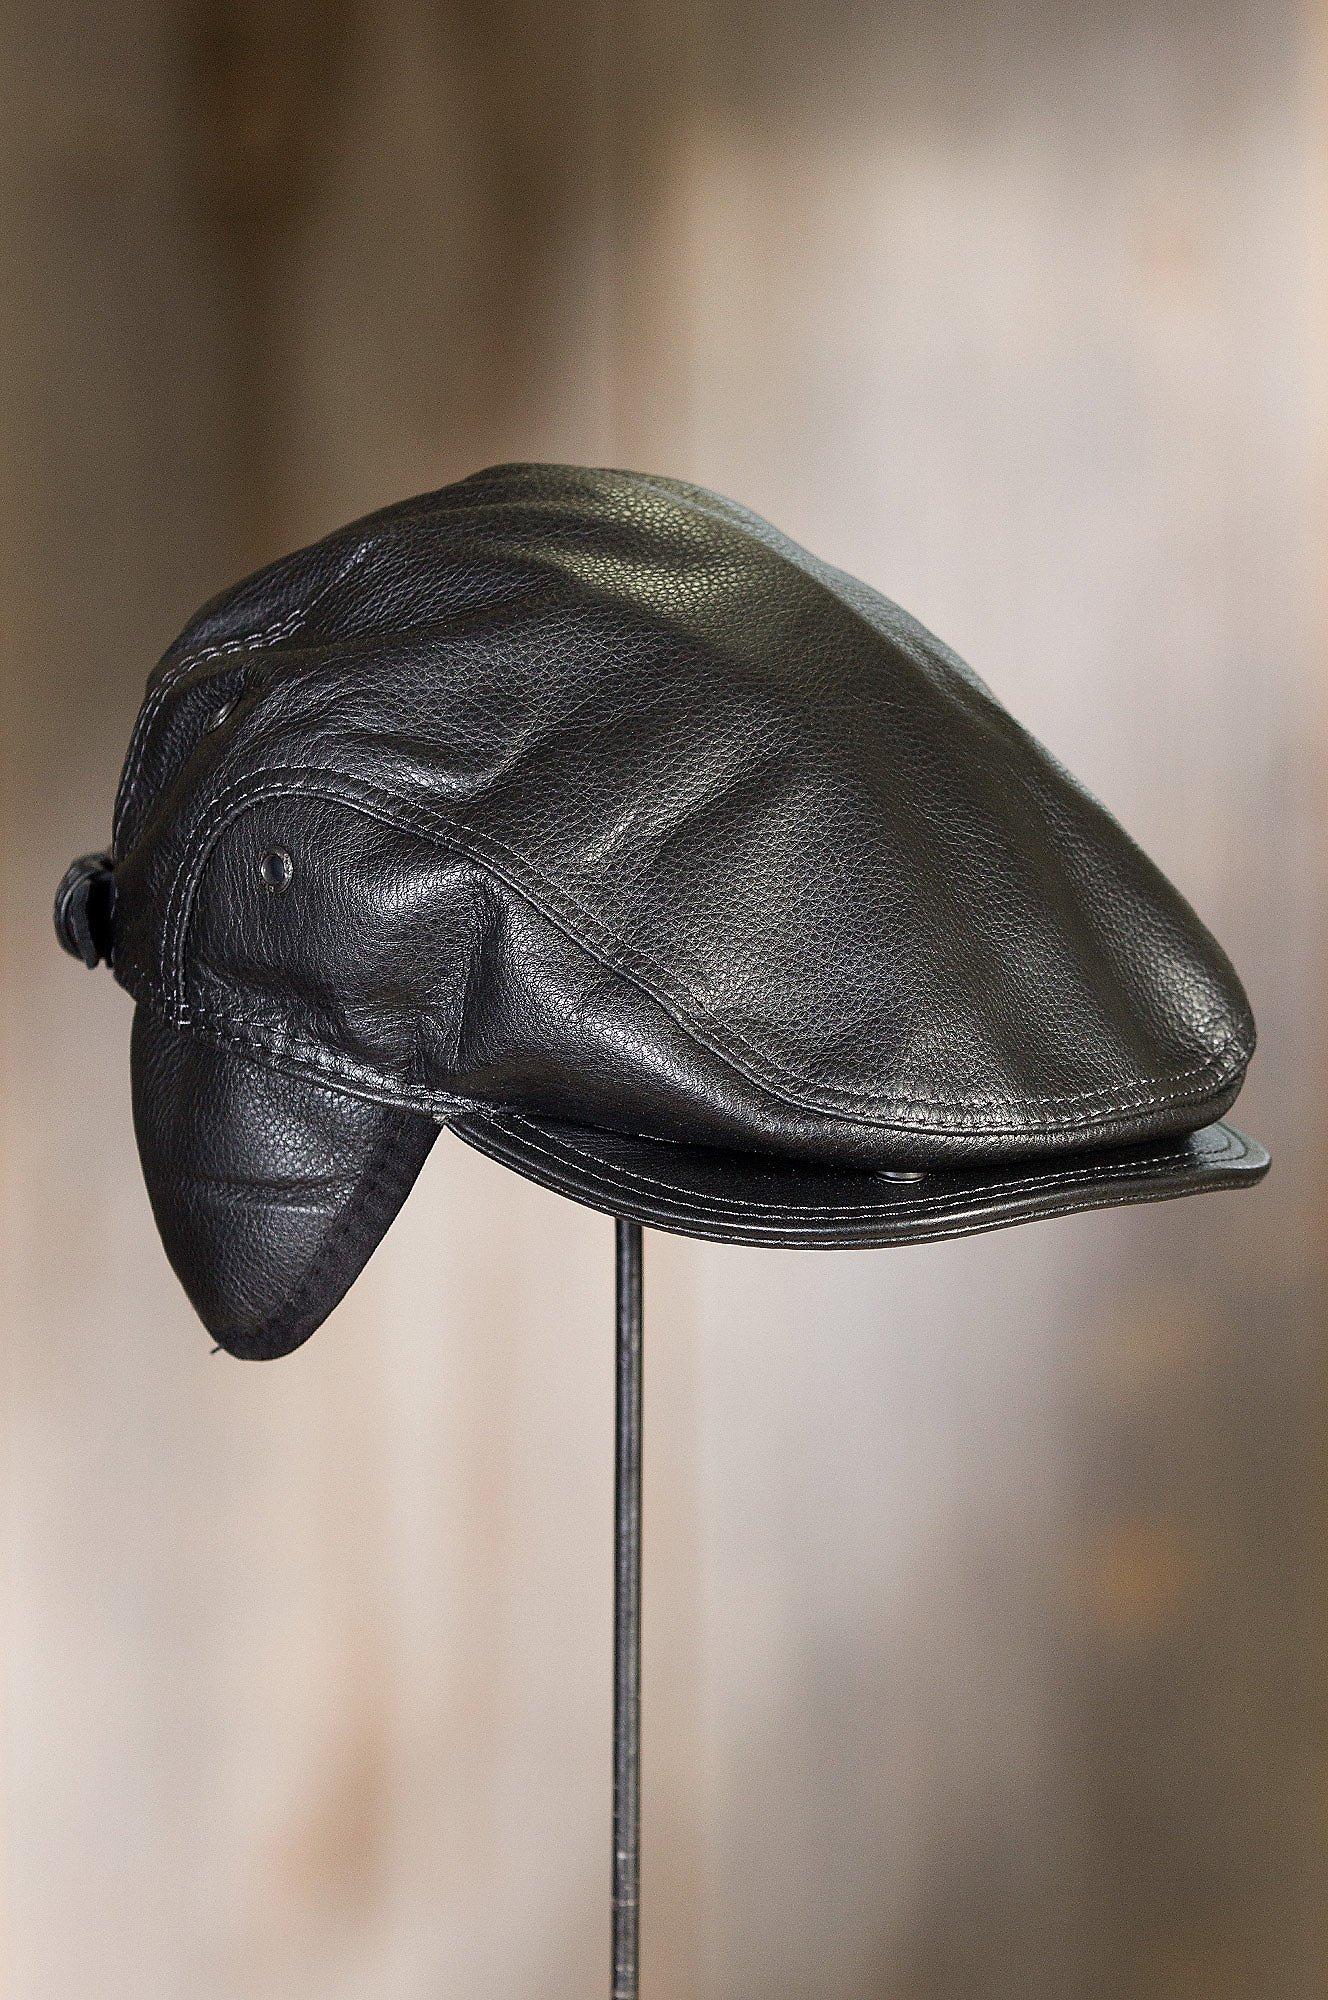 Overland Sheepskin Co. Allen Leather IVY Cap, Black, Size Large (7 1/4-7 3/8) by Overland Sheepskin Co (Image #4)